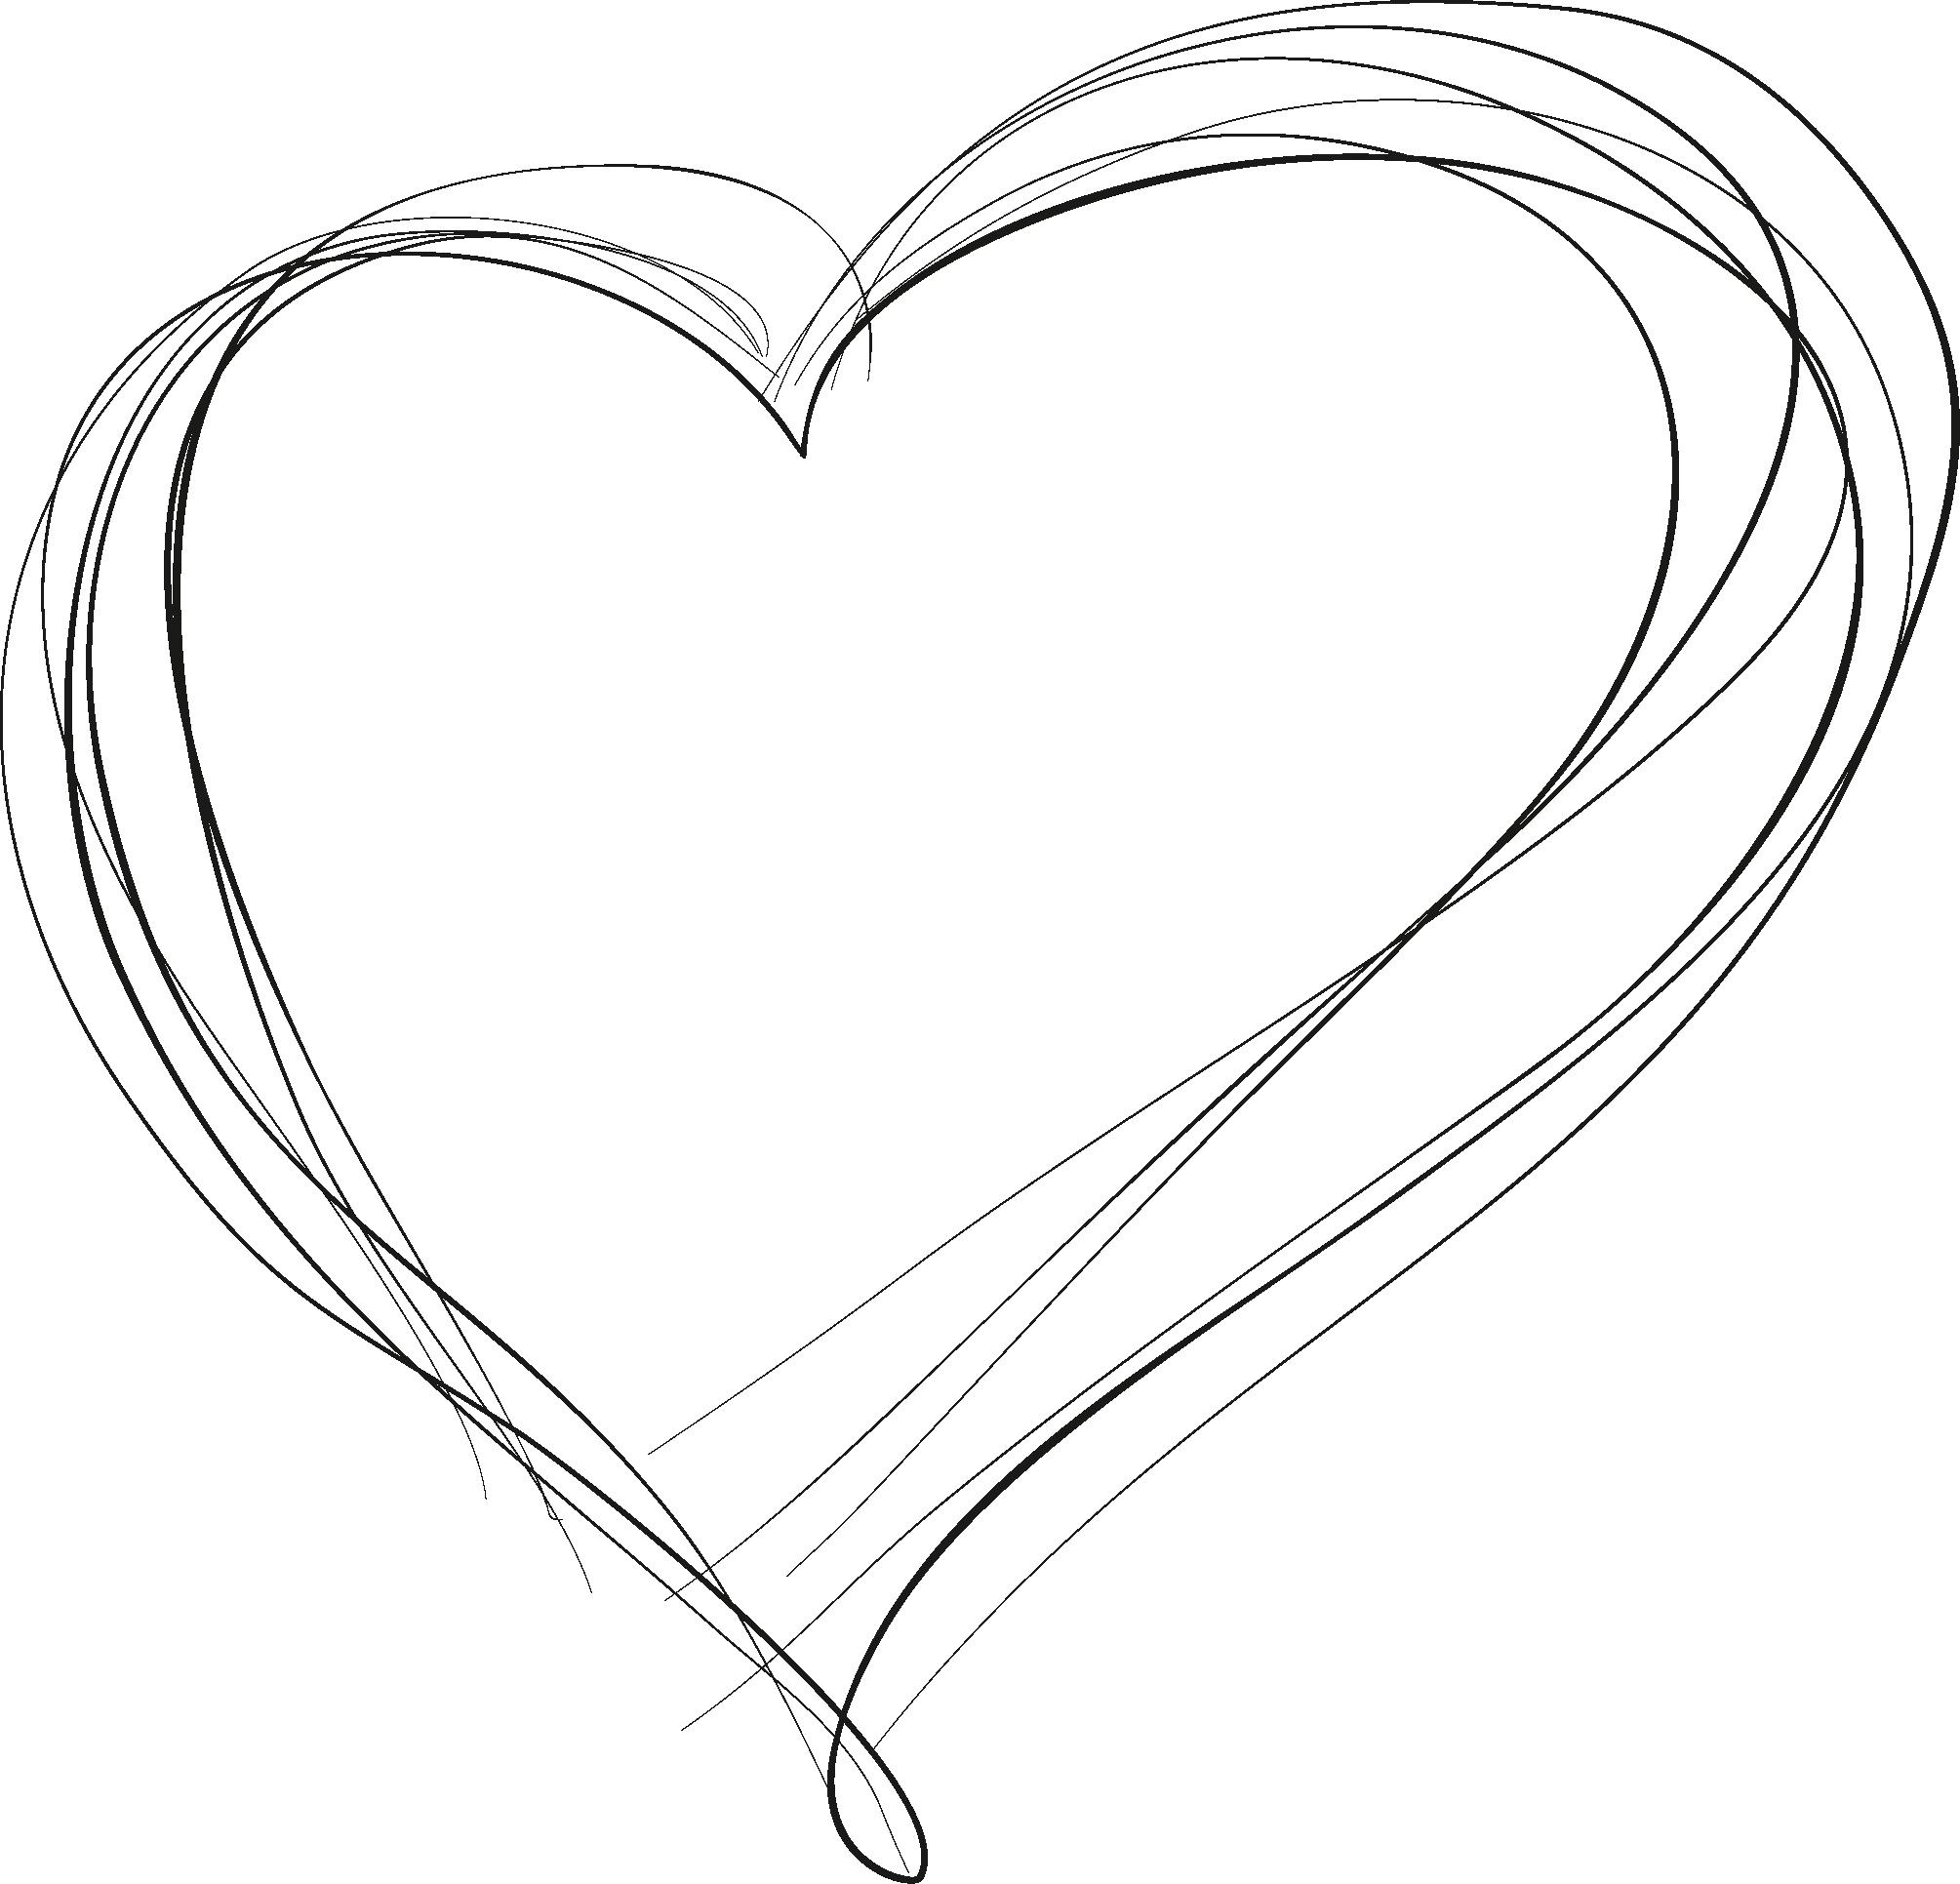 сердце контур картинка своих интервью артист